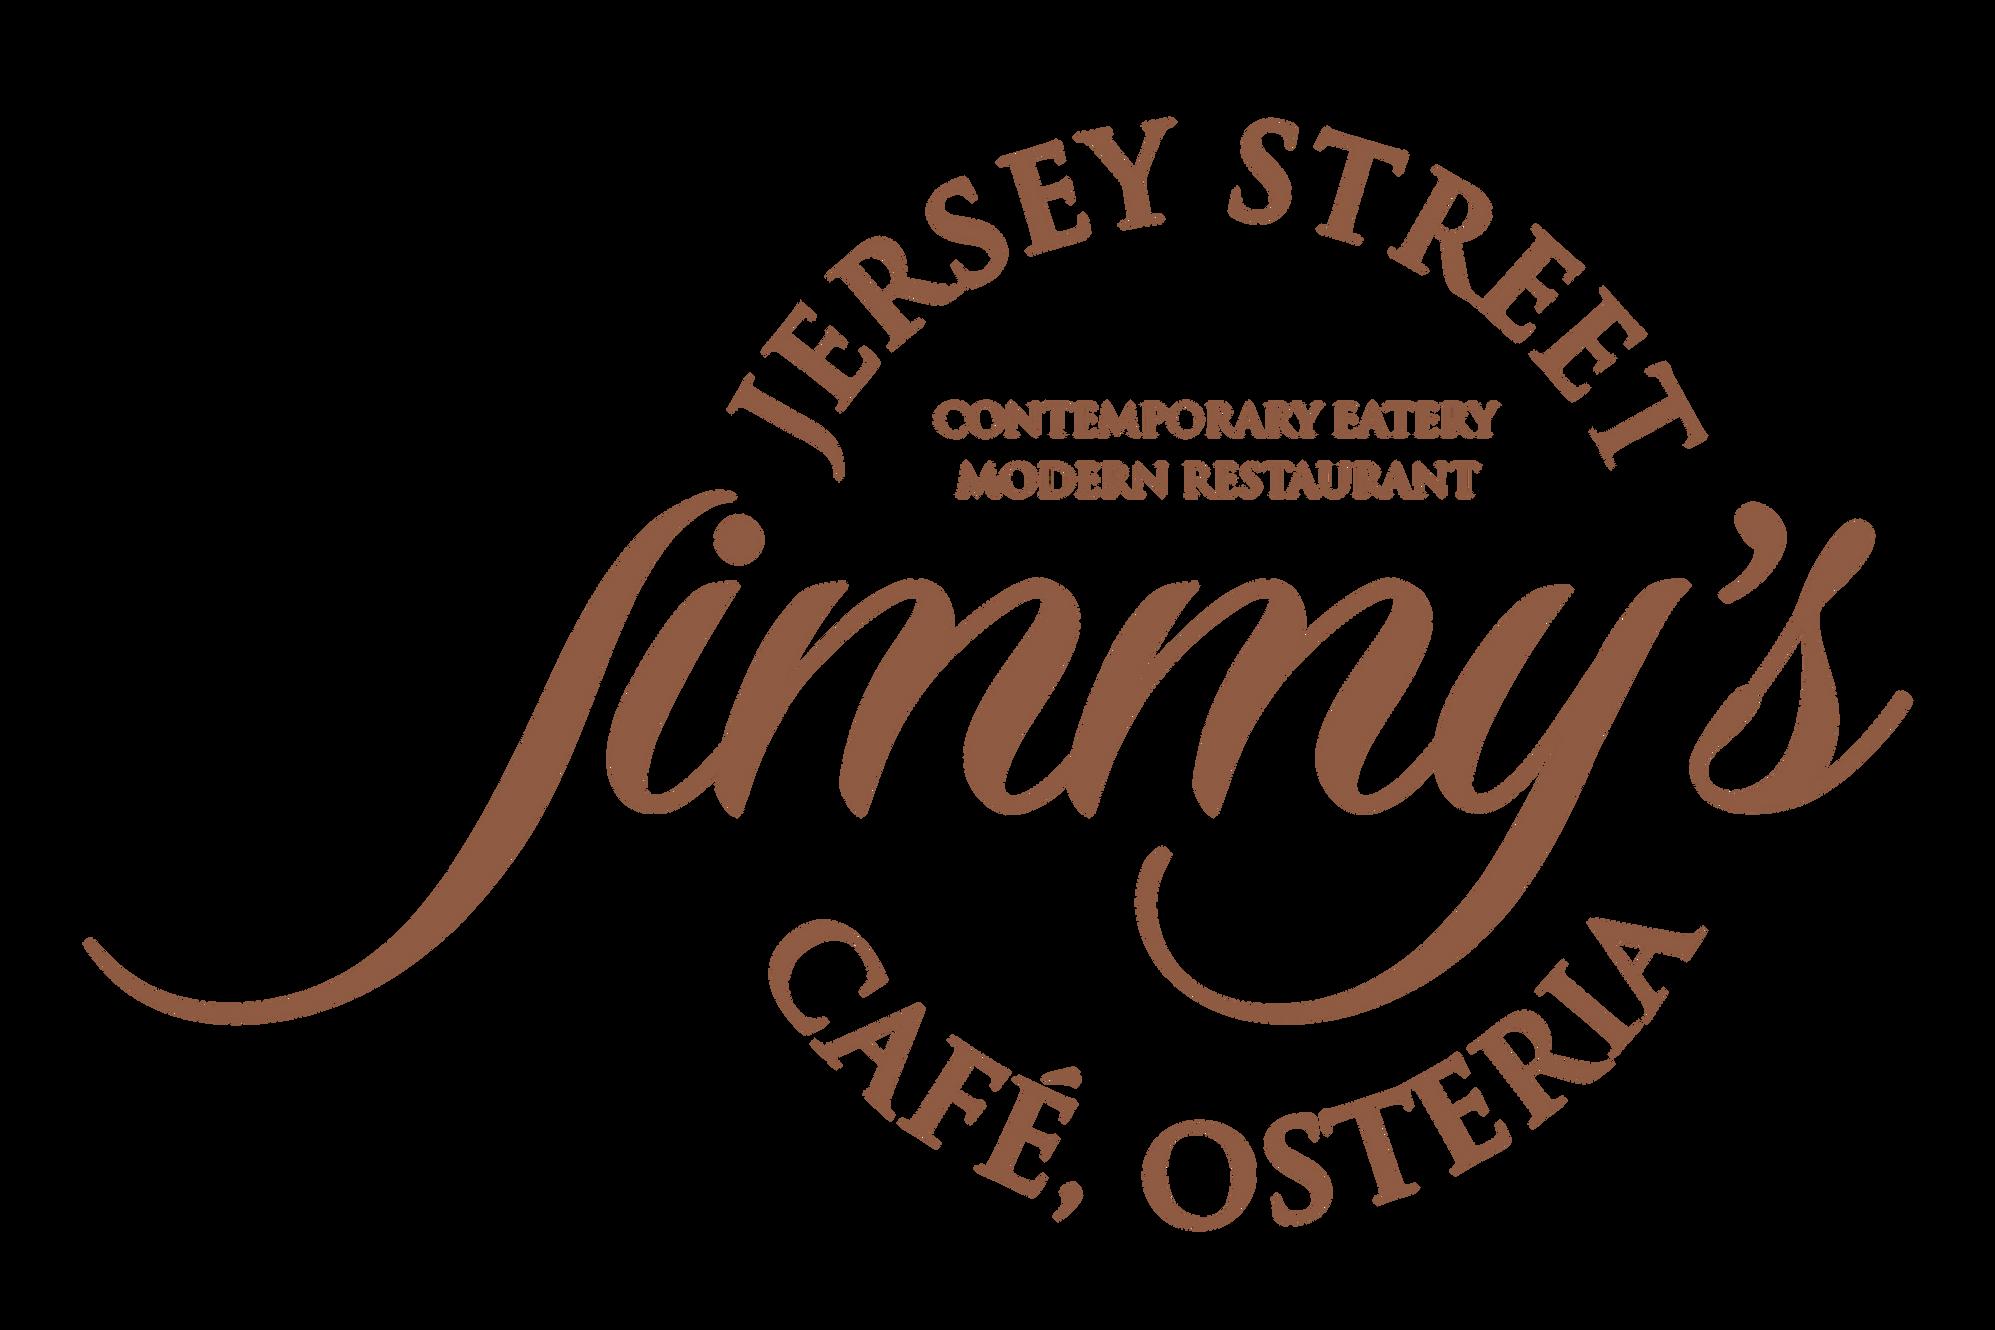 Jimmy's Jersey Street Cafe & Osteria   Italian Food